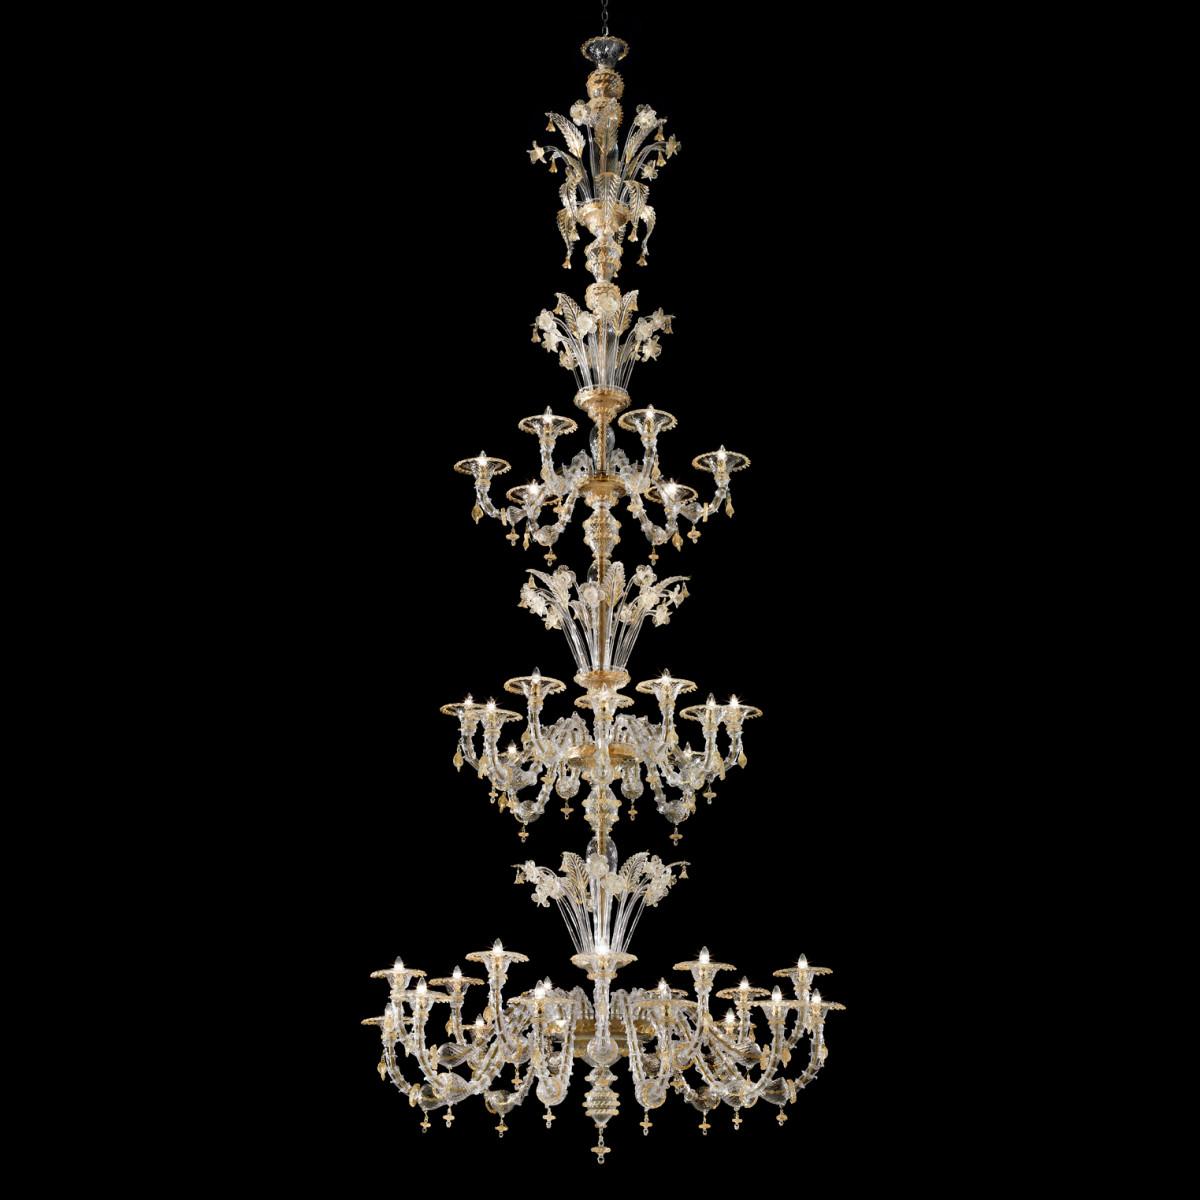 Bellini lustre en verre de Murano - Transparent or 24 carats